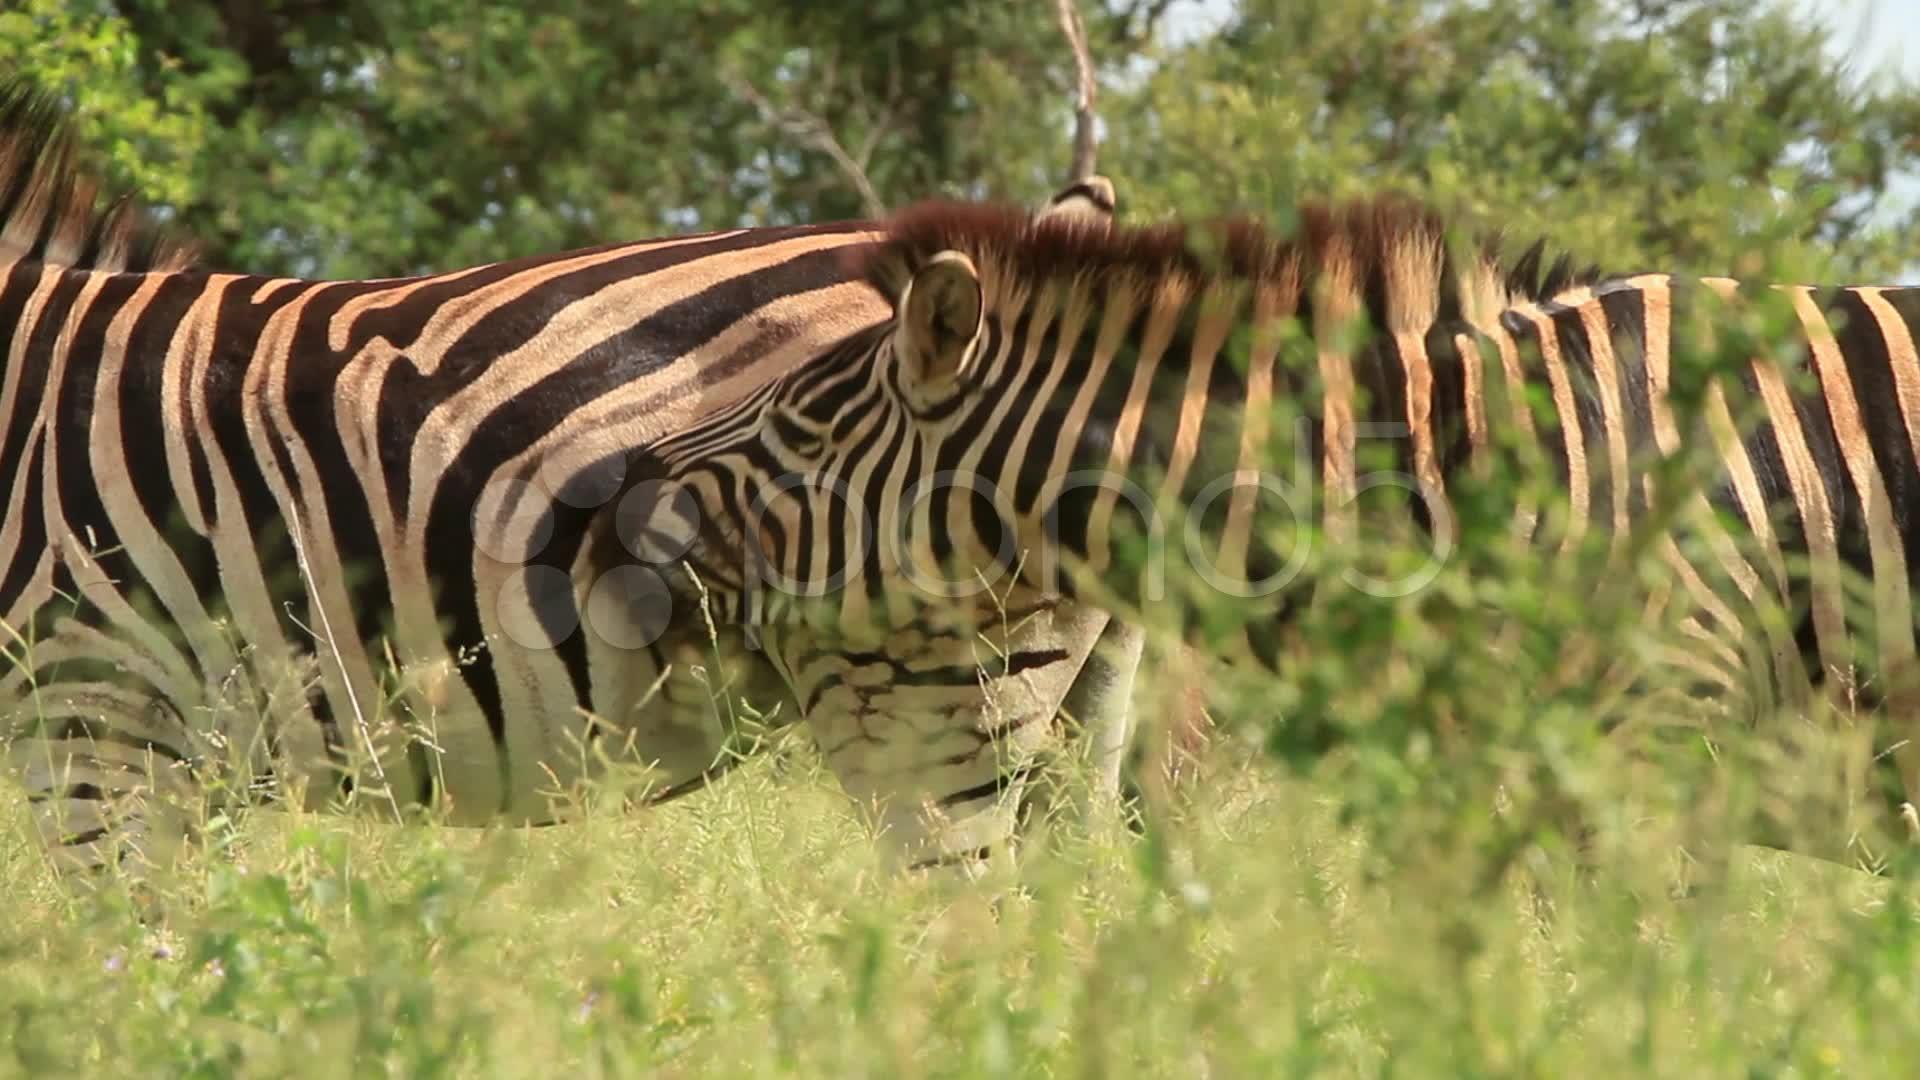 Zebras mating - photo#49